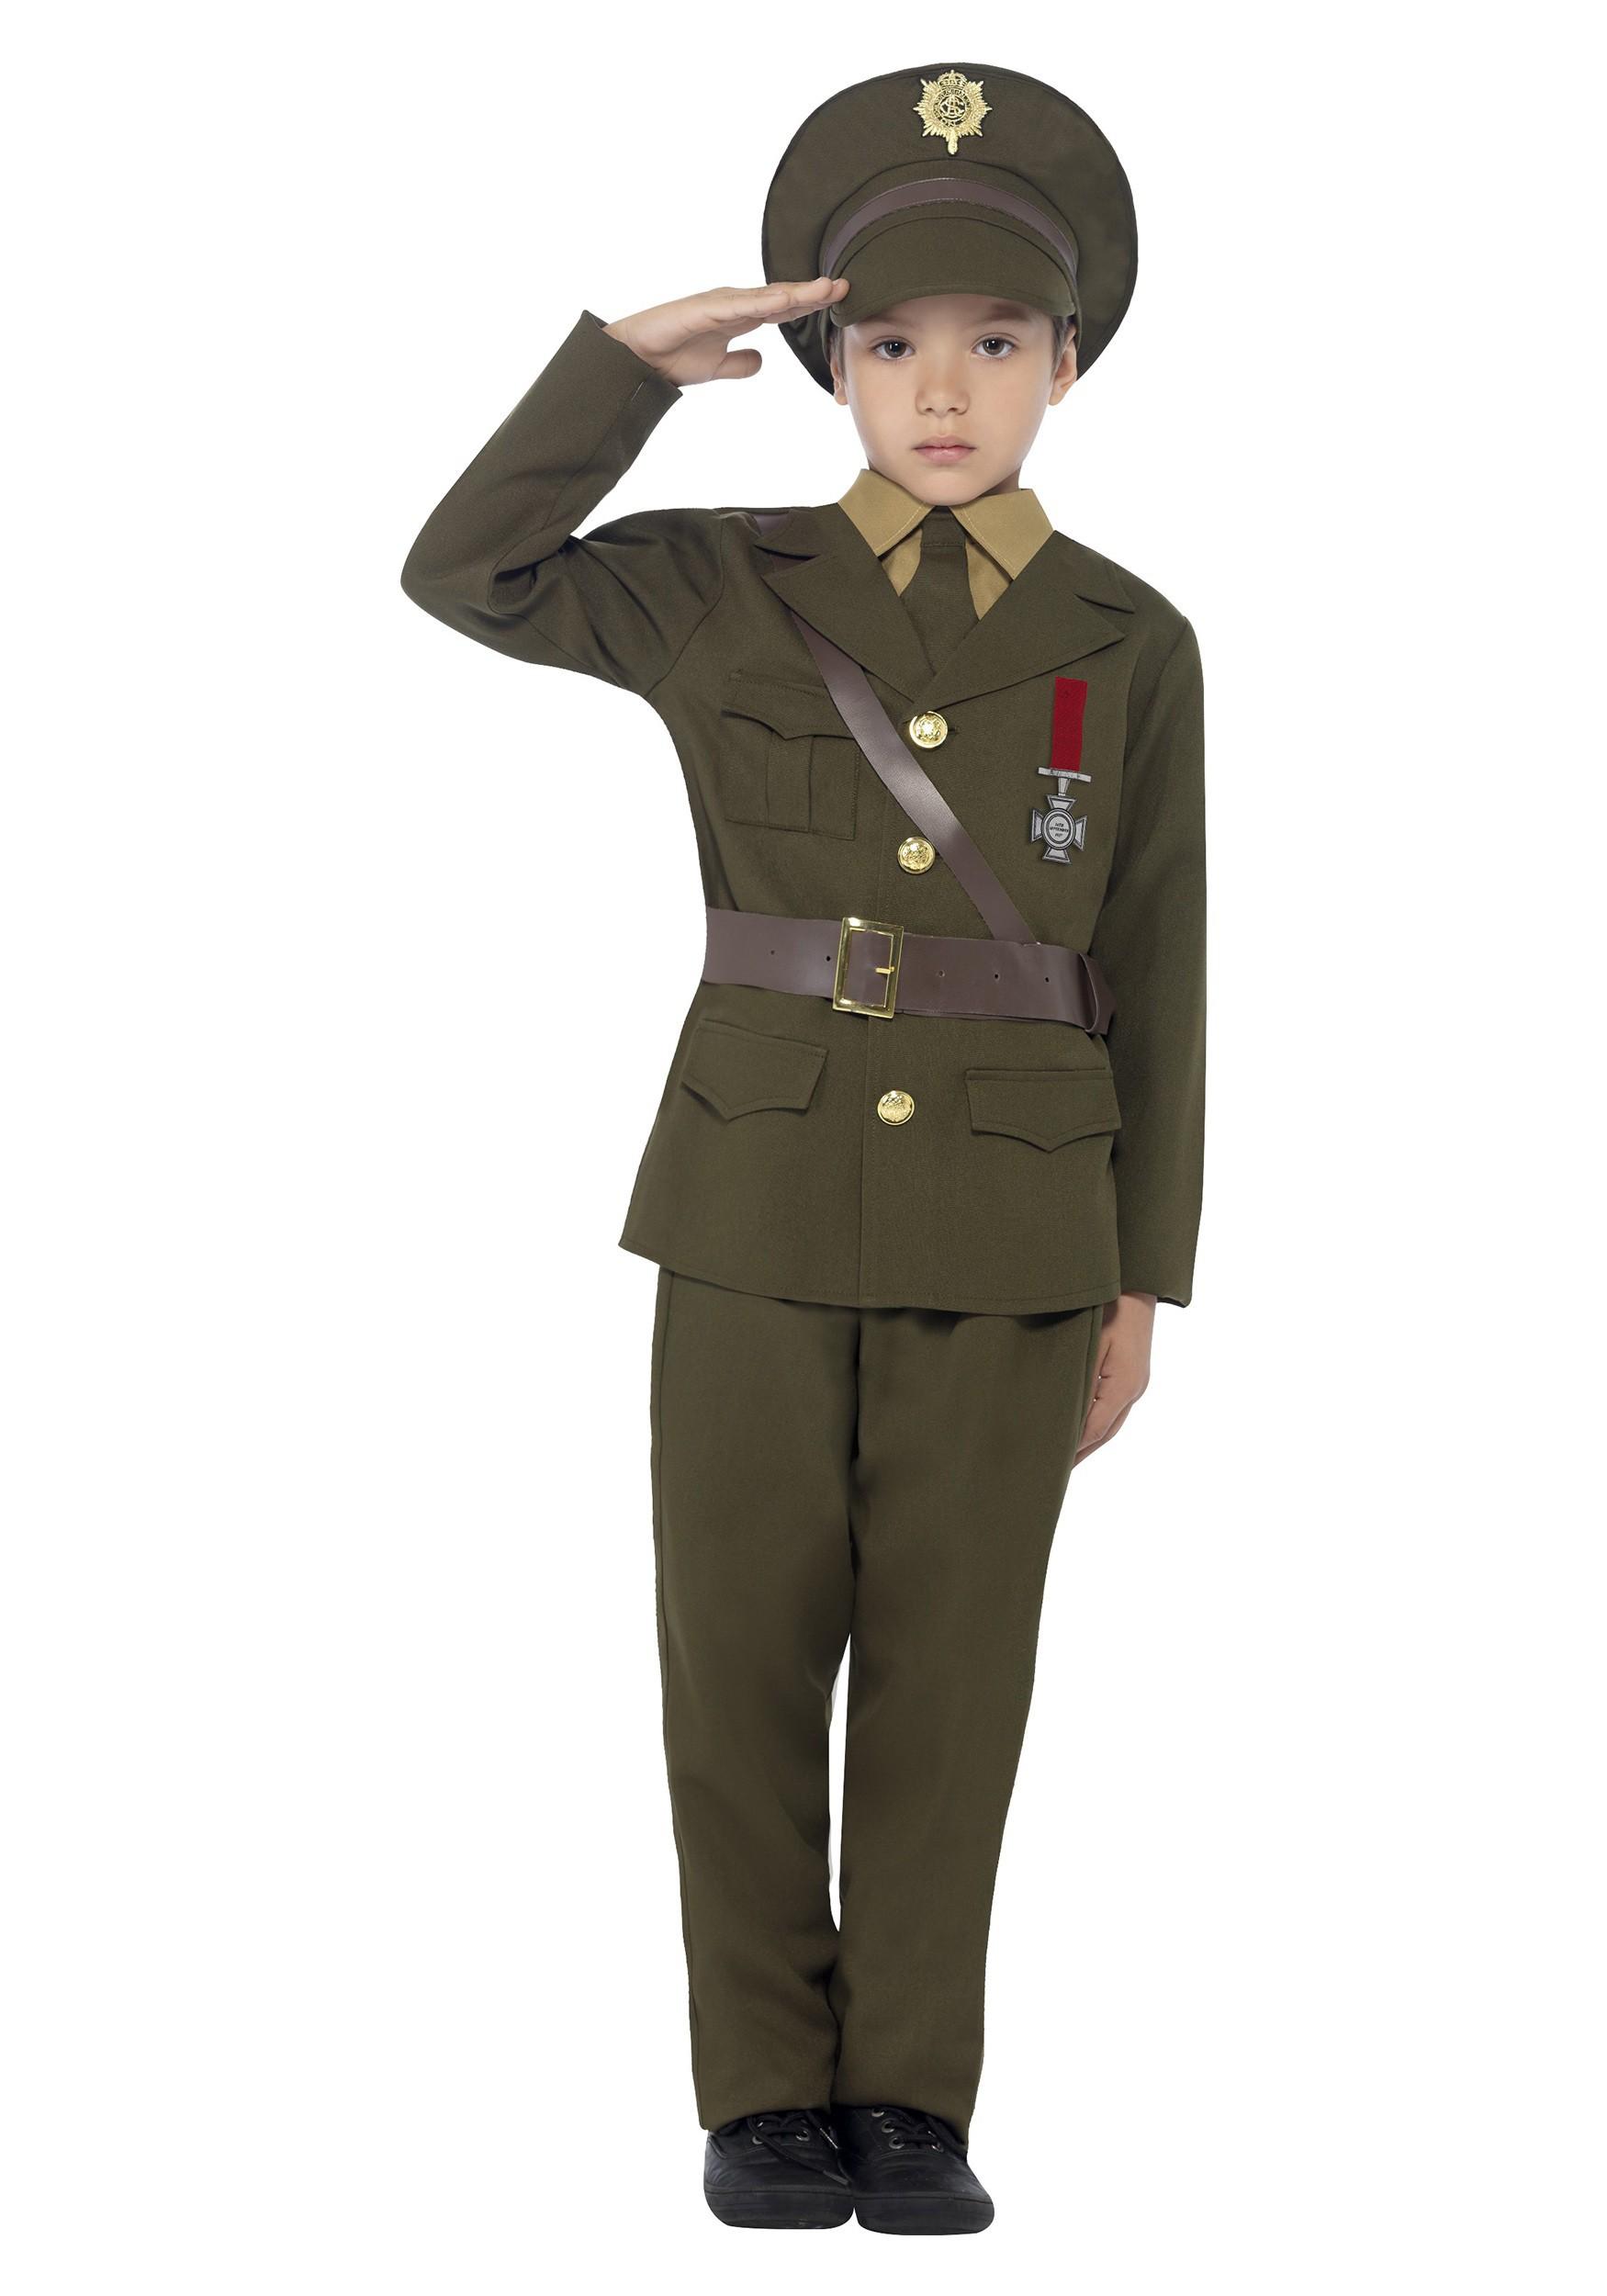 sc 1 st  Halloween Costumes UK & Childu0027s Army Officer Costume